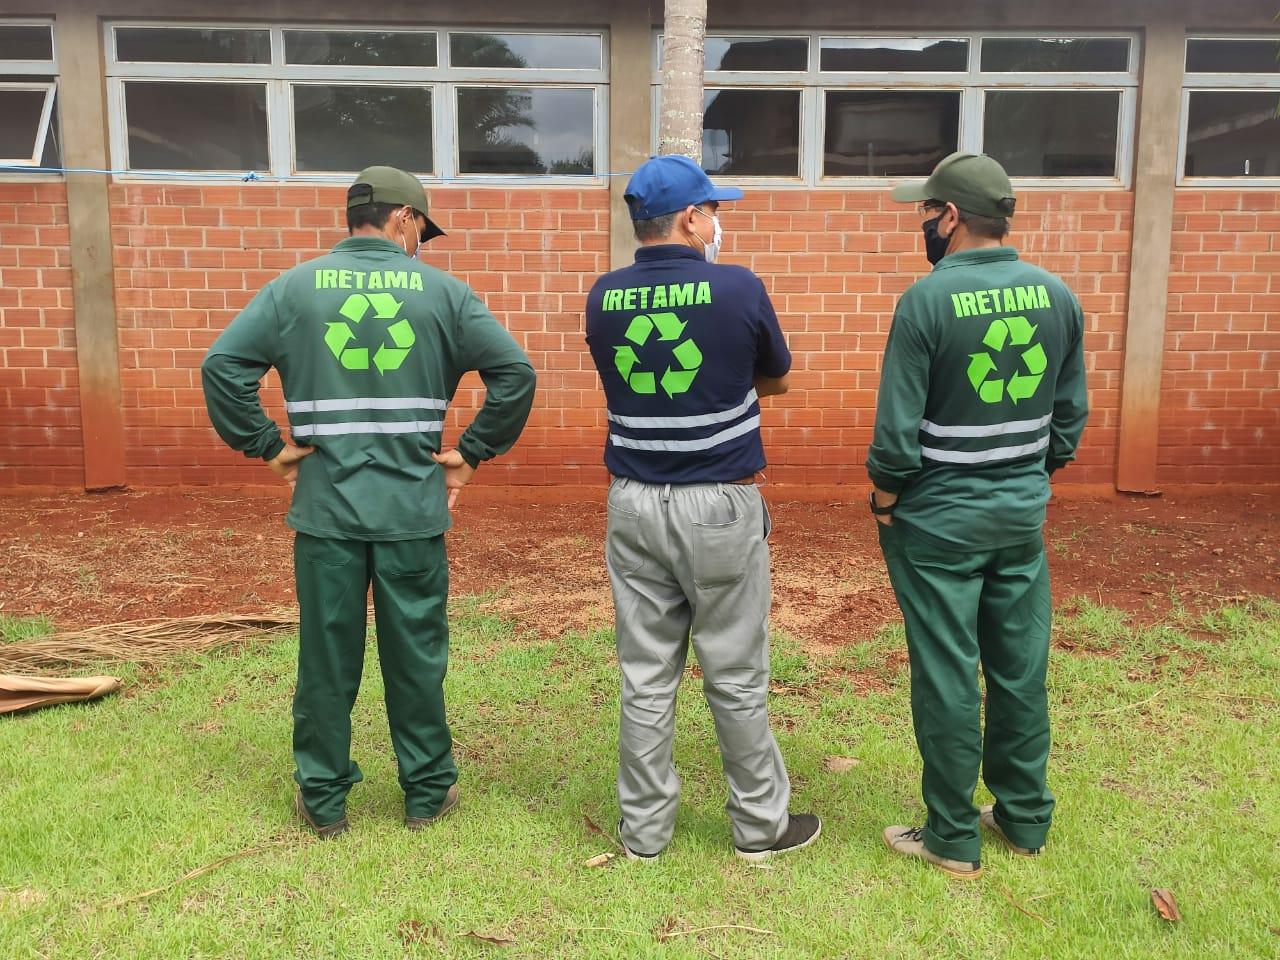 Entrega de Uniformes para os coletores de resíduos do Município de Iretama